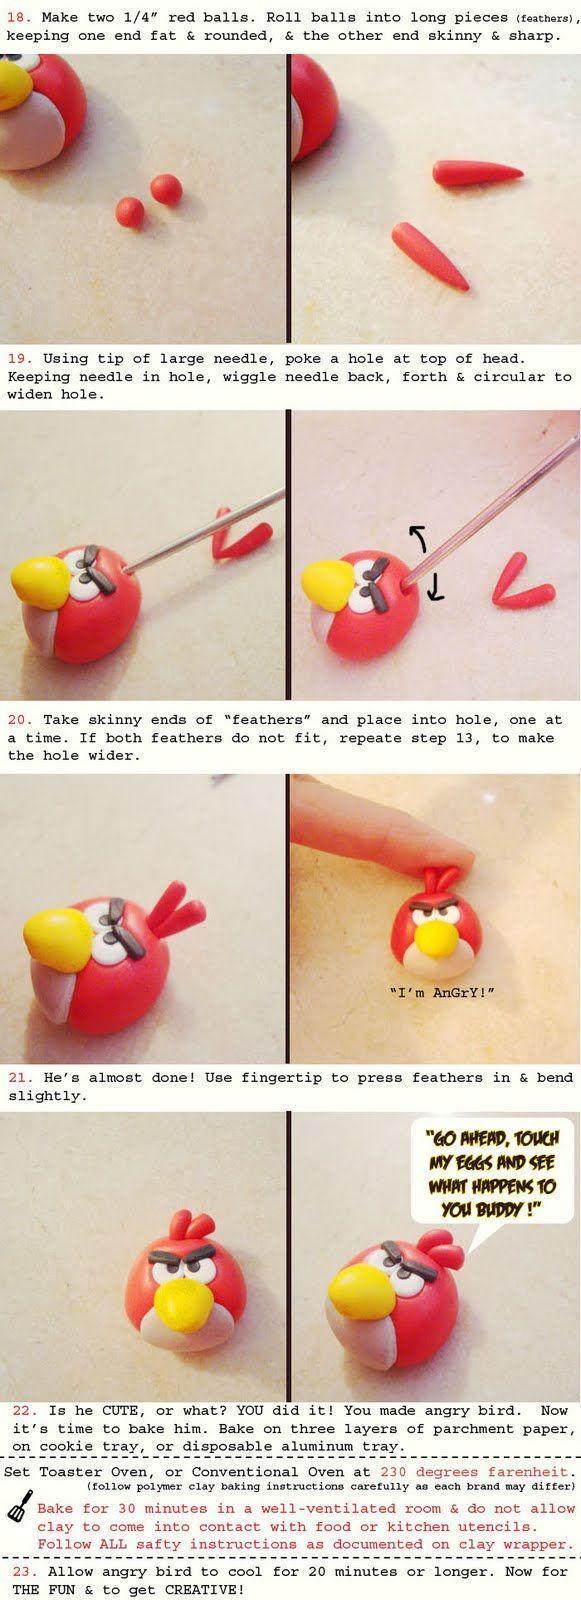 Angry Bird tutorial